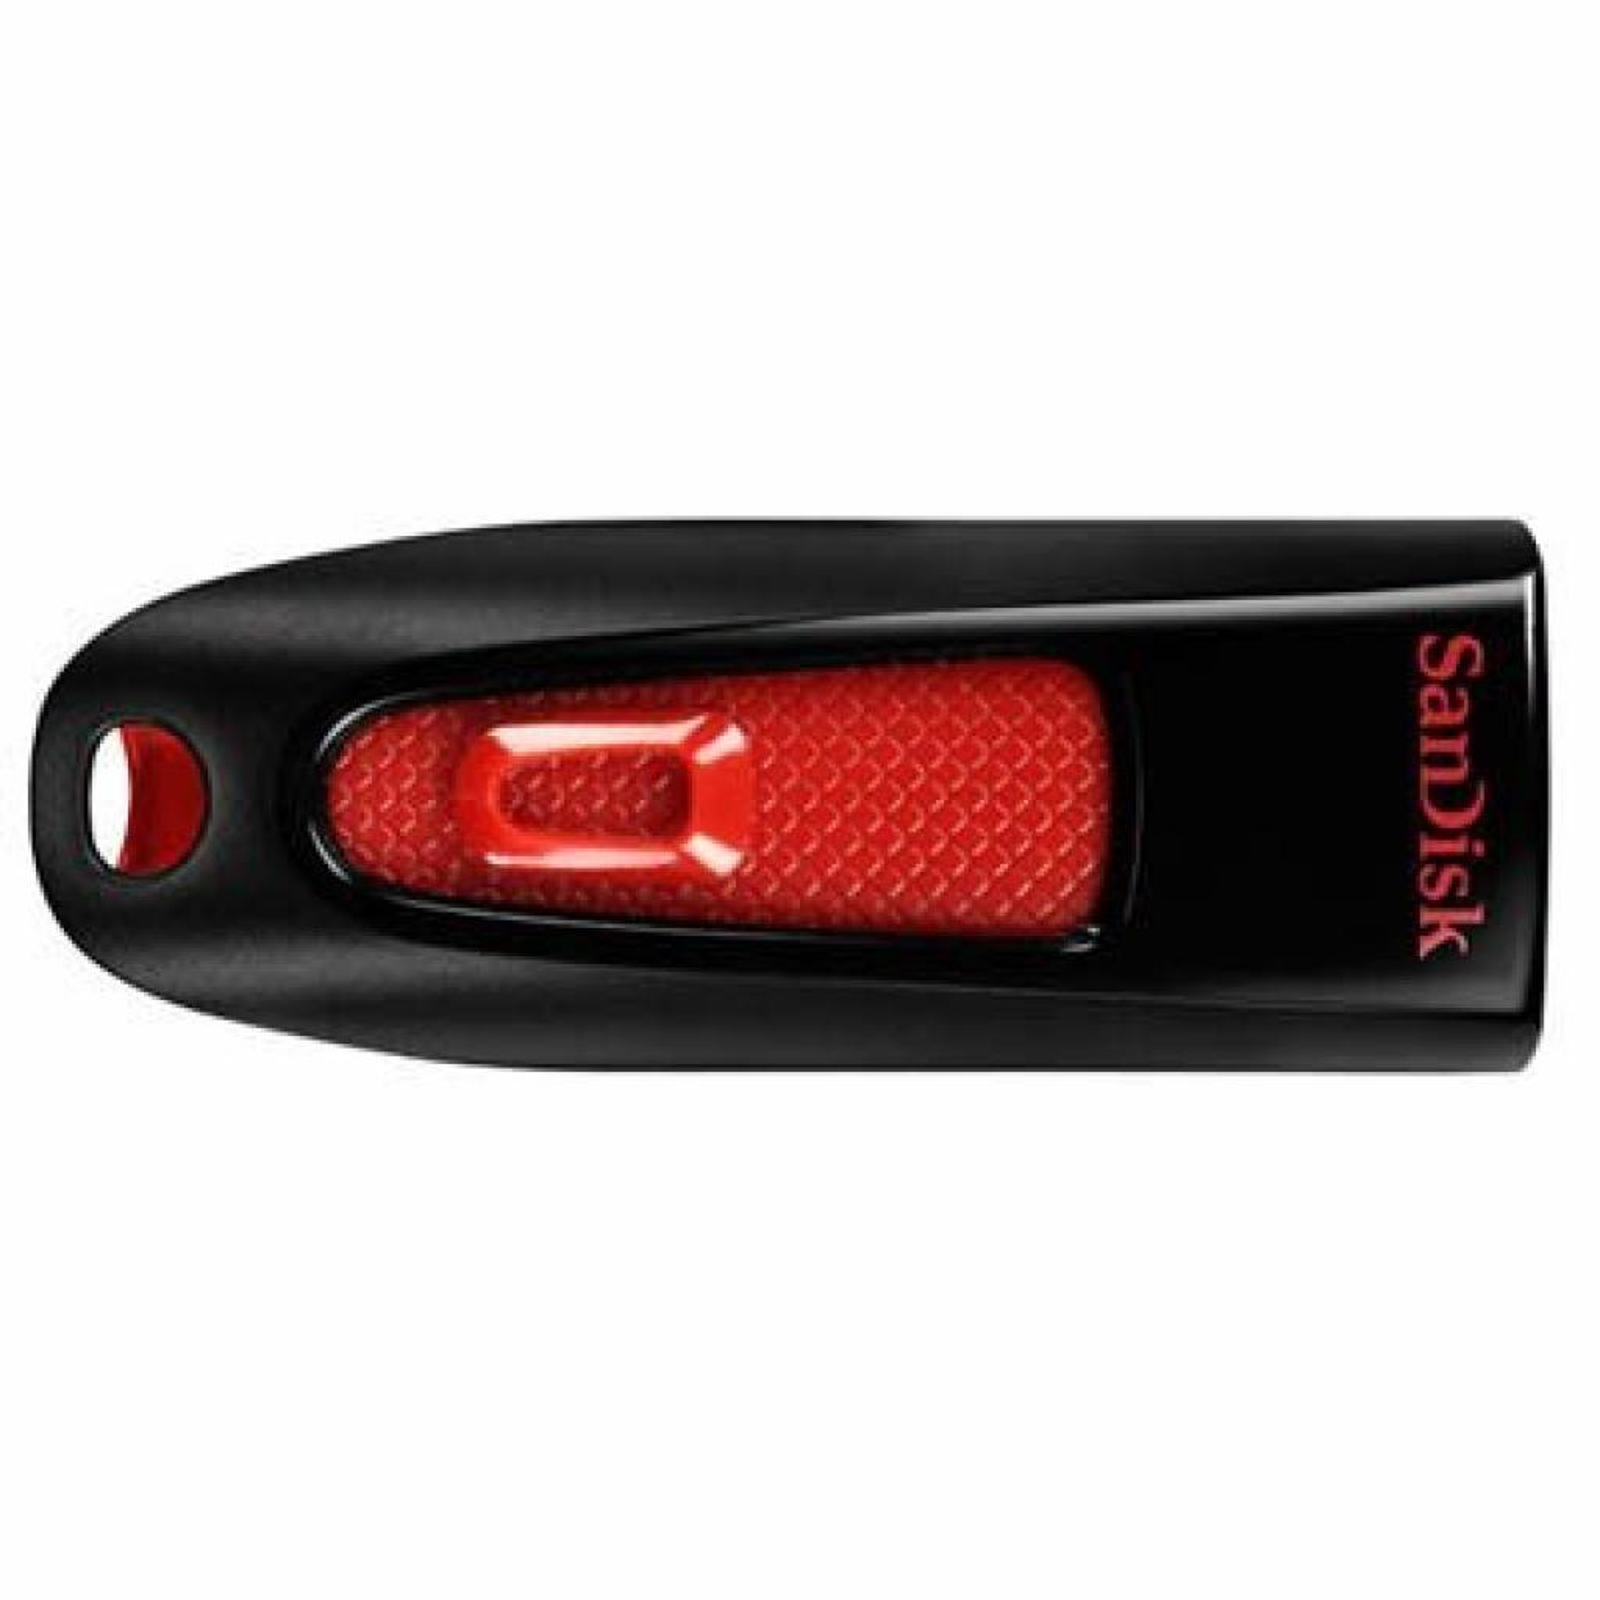 USB флеш накопитель SANDISK 8Gb Cruzer Ultra (SDCZ45-008G-U46)